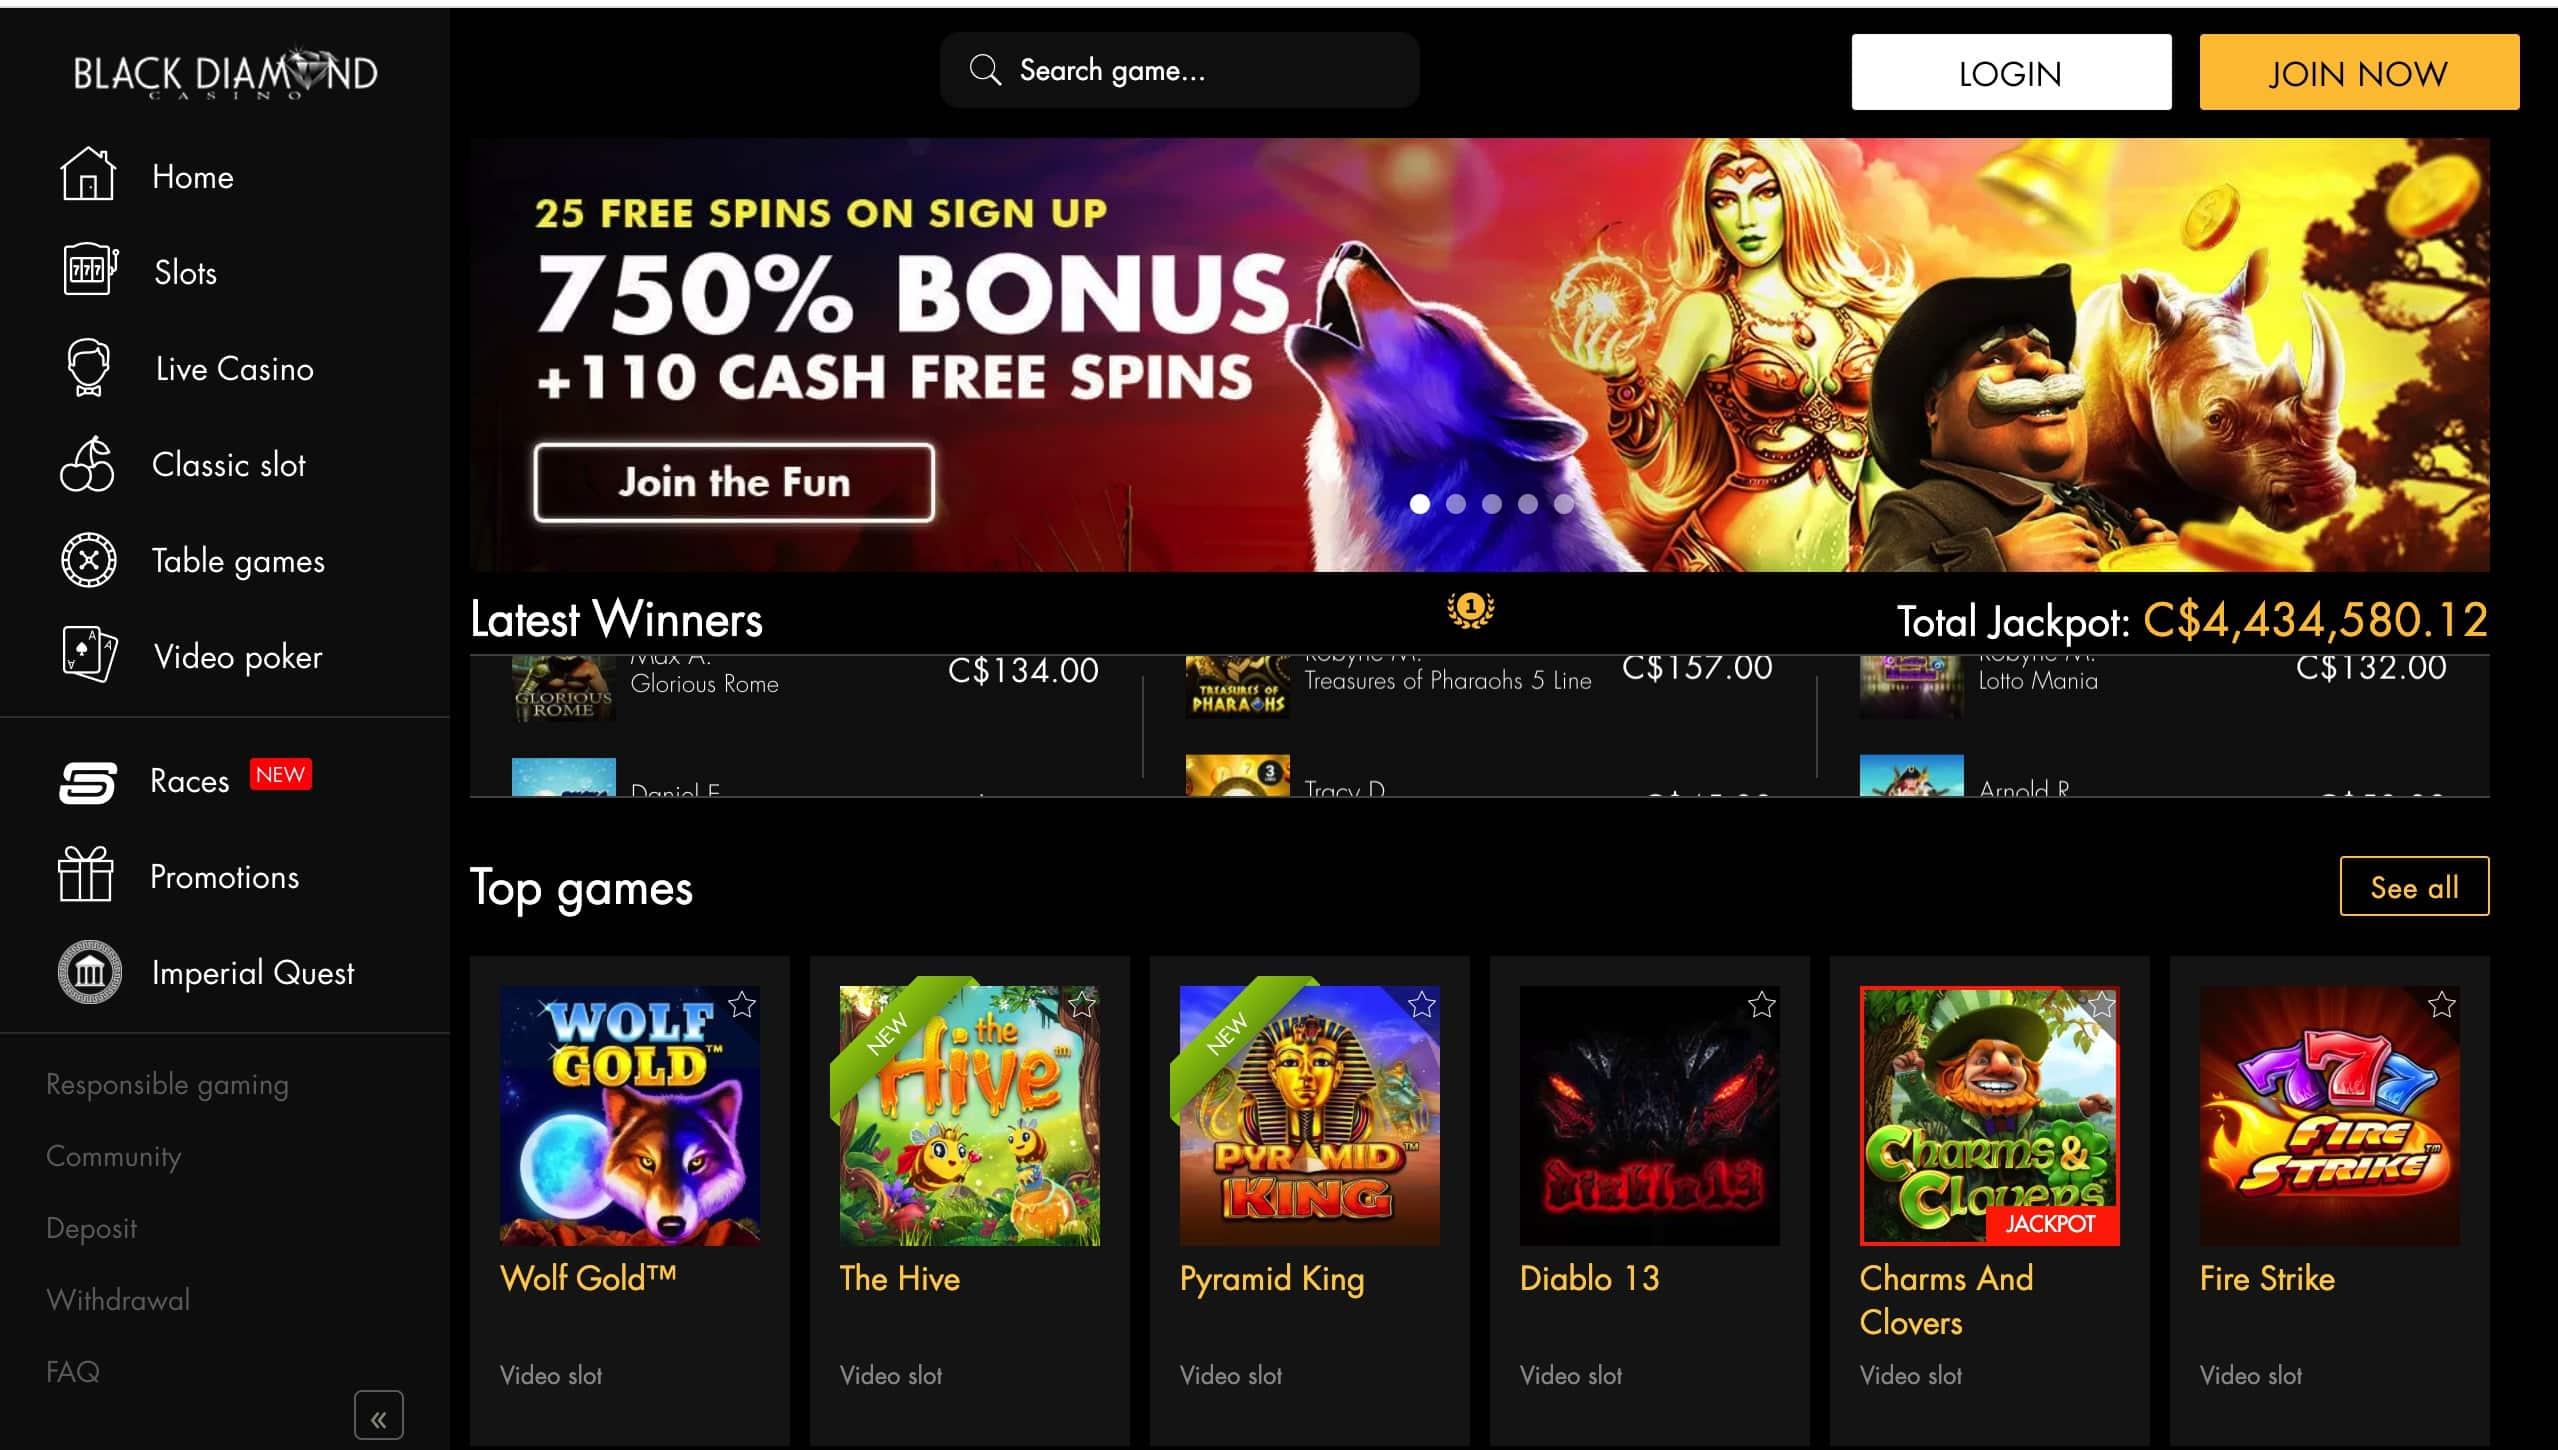 Black Diamond Casino 25 Free Spins 675 Deposit Bonus